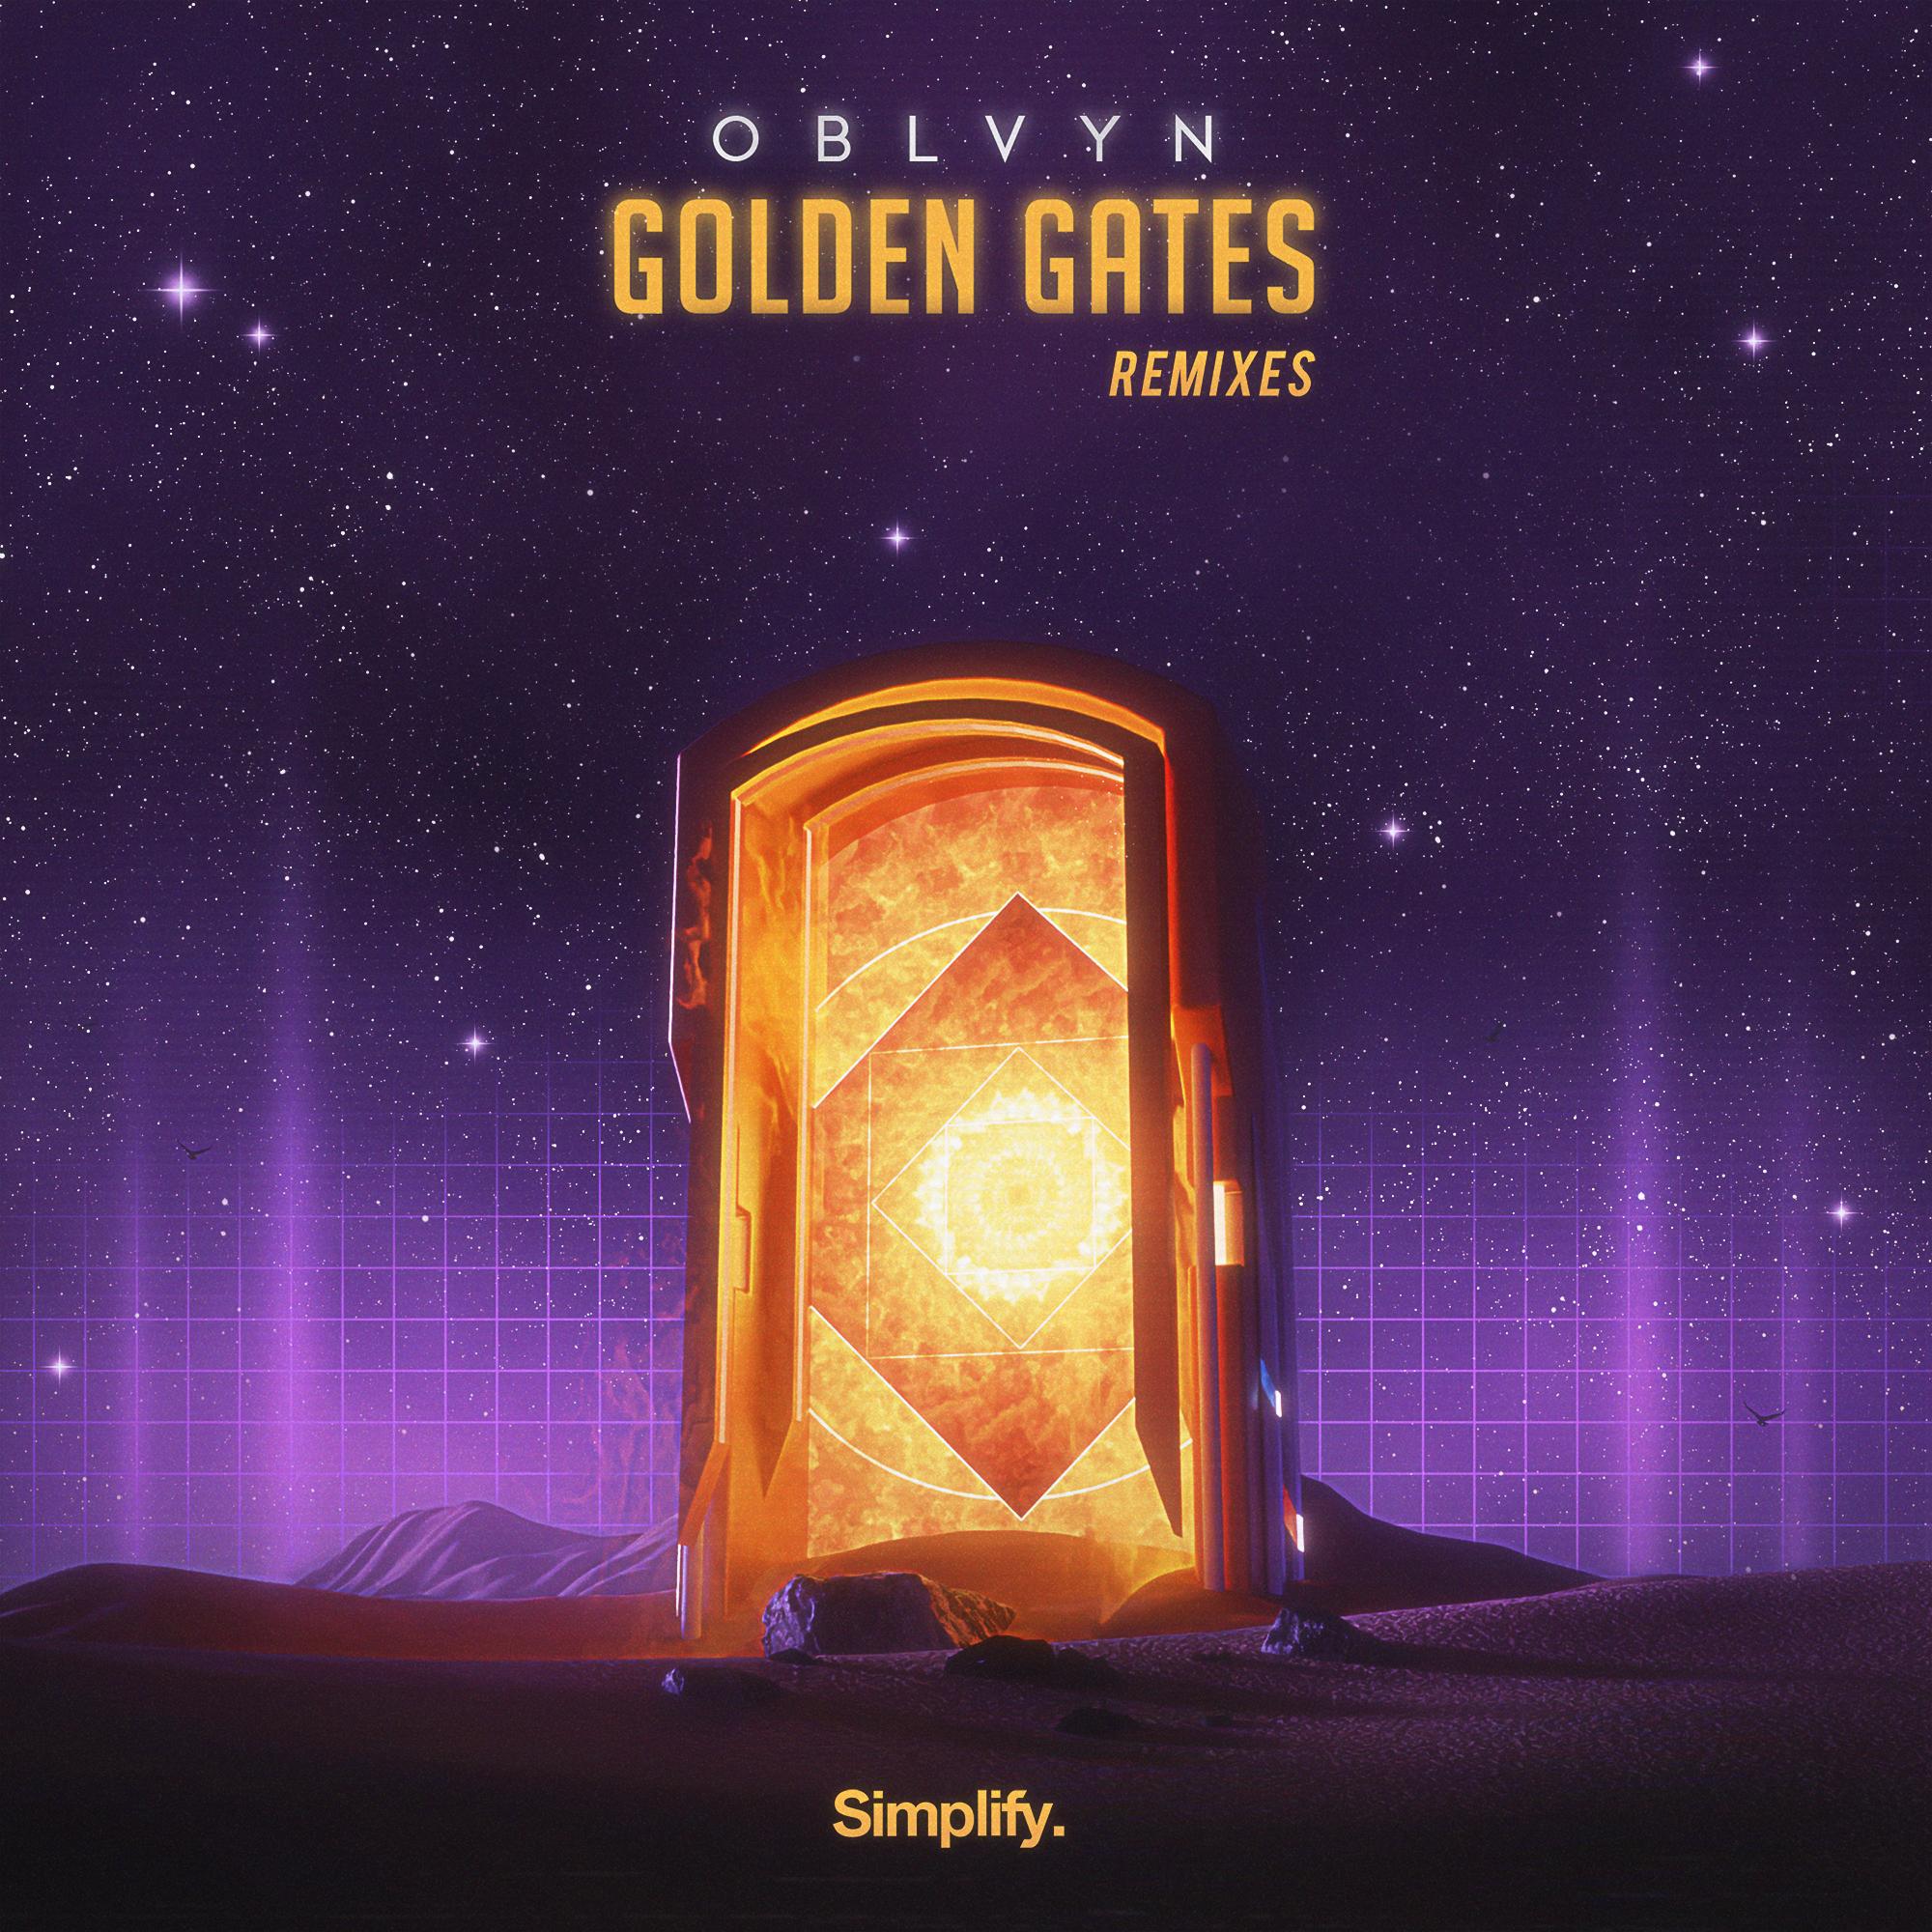 Golden Gates (Remixes) Image